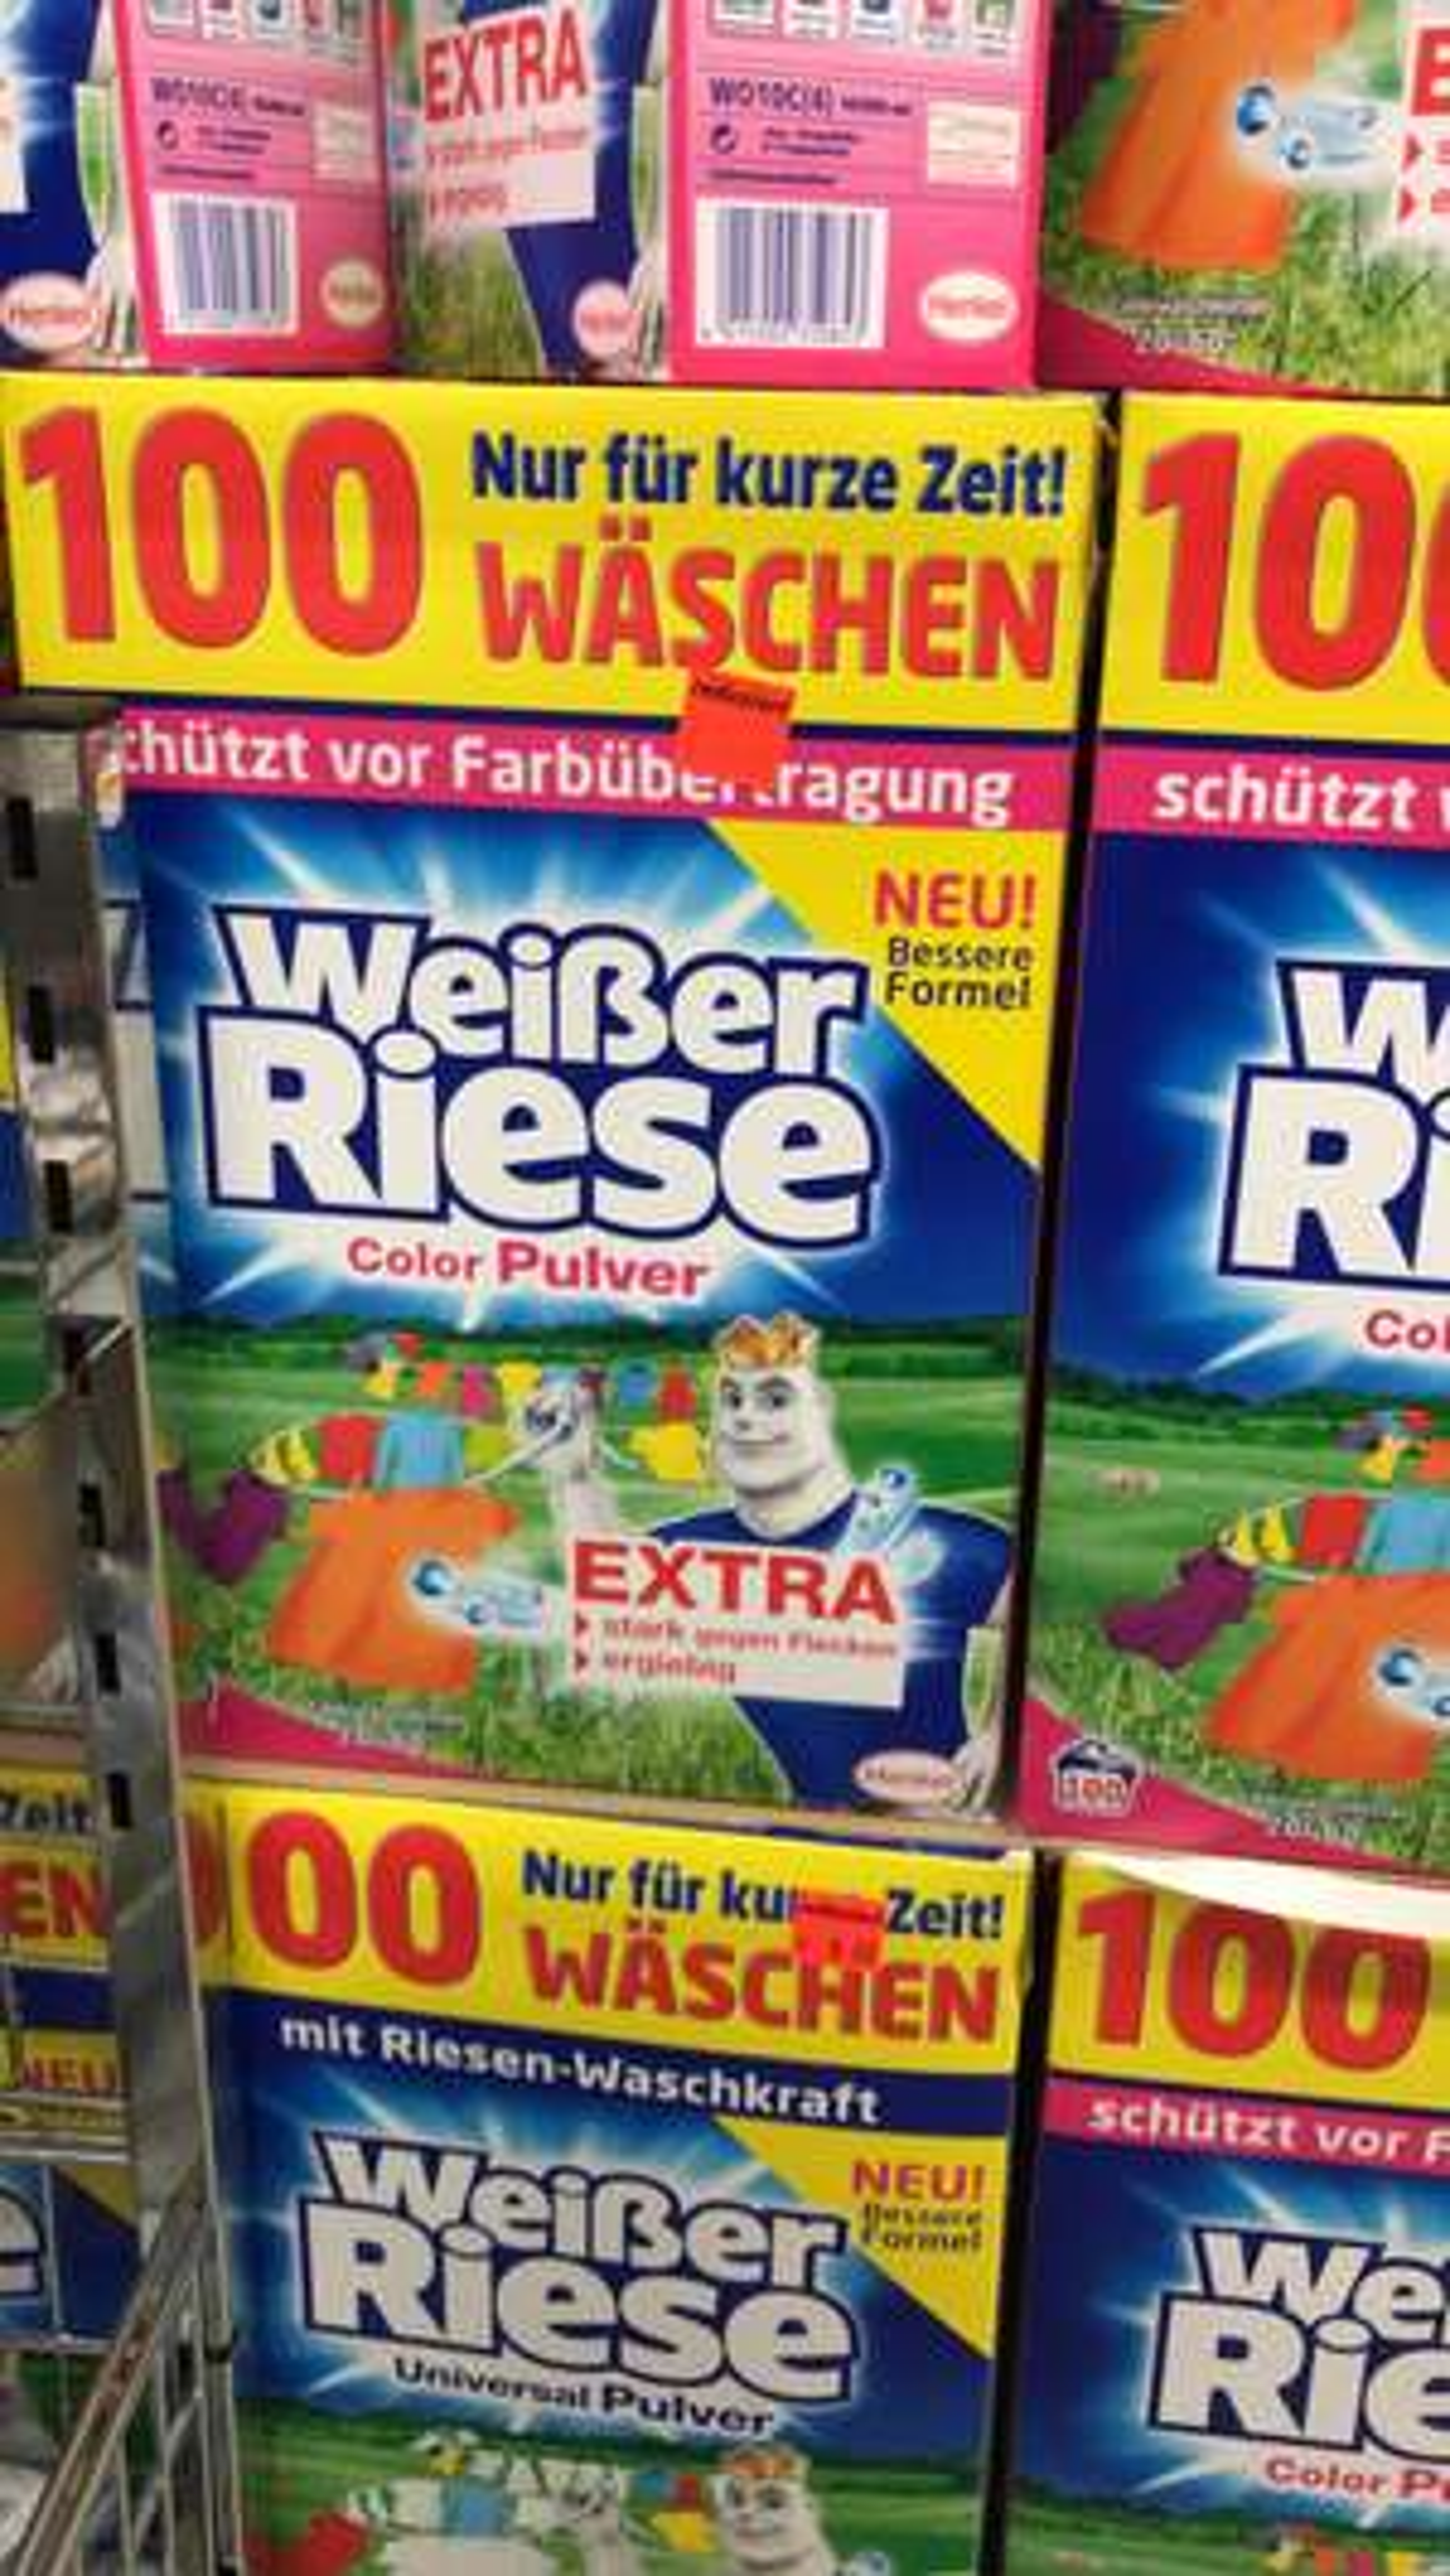 [Lokal - Aldi Hannover] Weisser Riese Waschpulver Universal/ Color